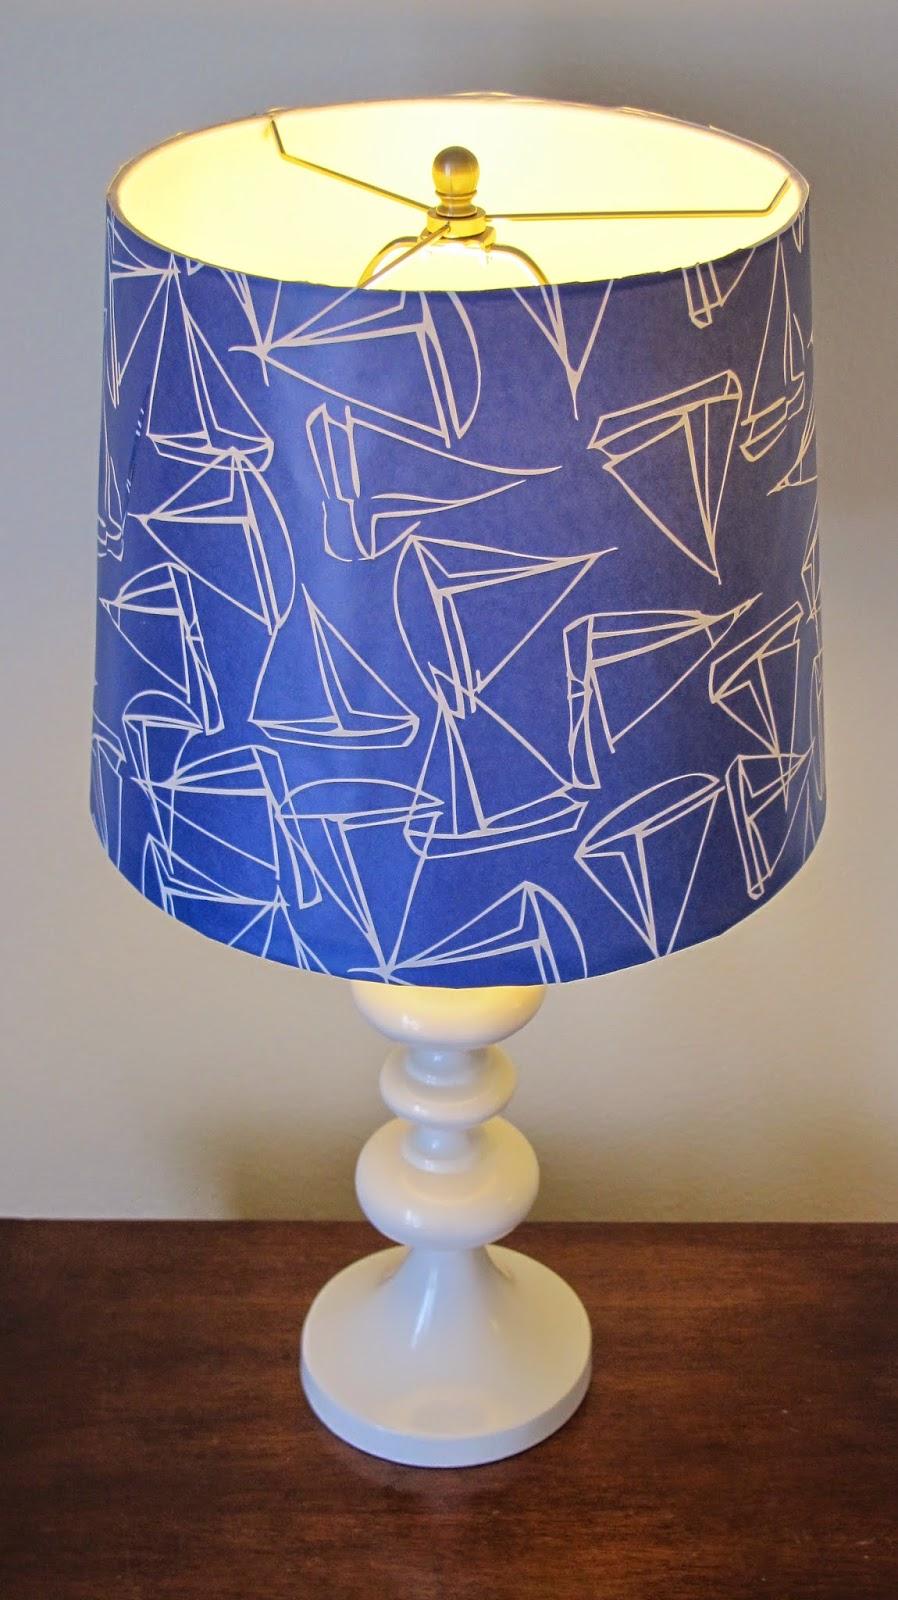 Wallpaper Lamp Shades : Nautical by Nature: My Apartment: DIY Nautical Wallpaper Lamp Shade Project